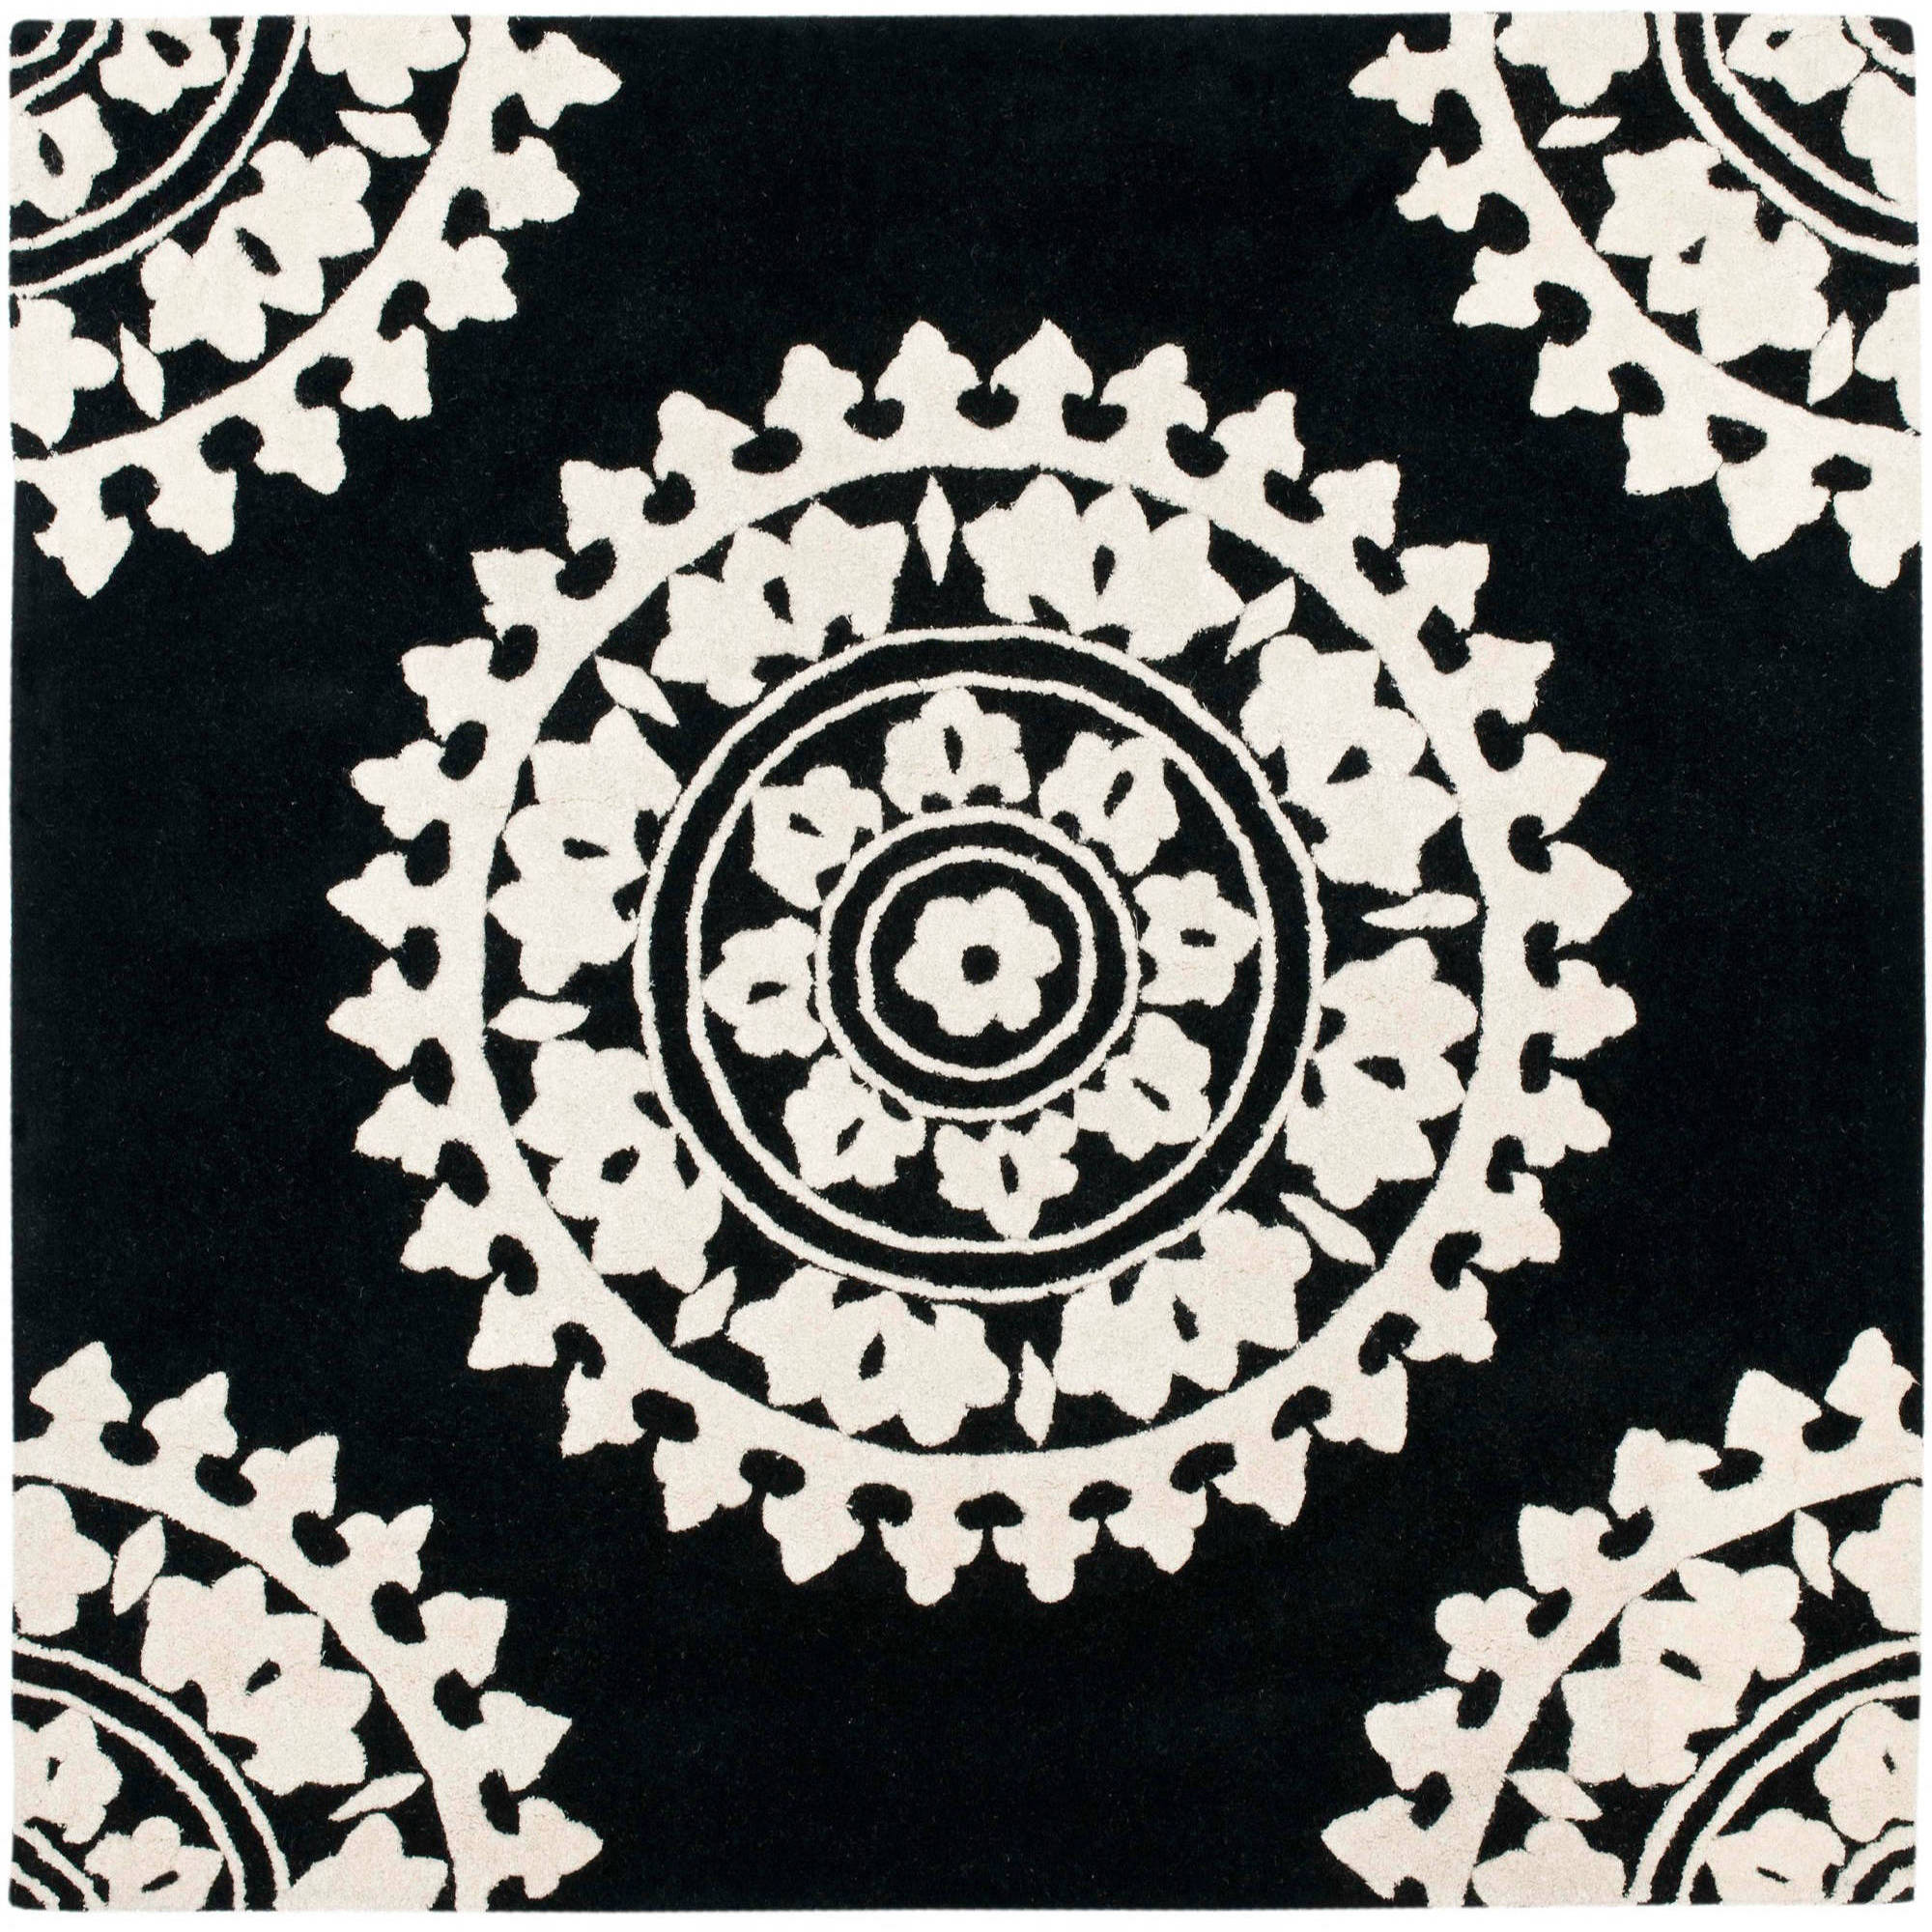 Safavieh Soho Aubrey Wool Square Rug, Black/Ivory, 6' x 6'